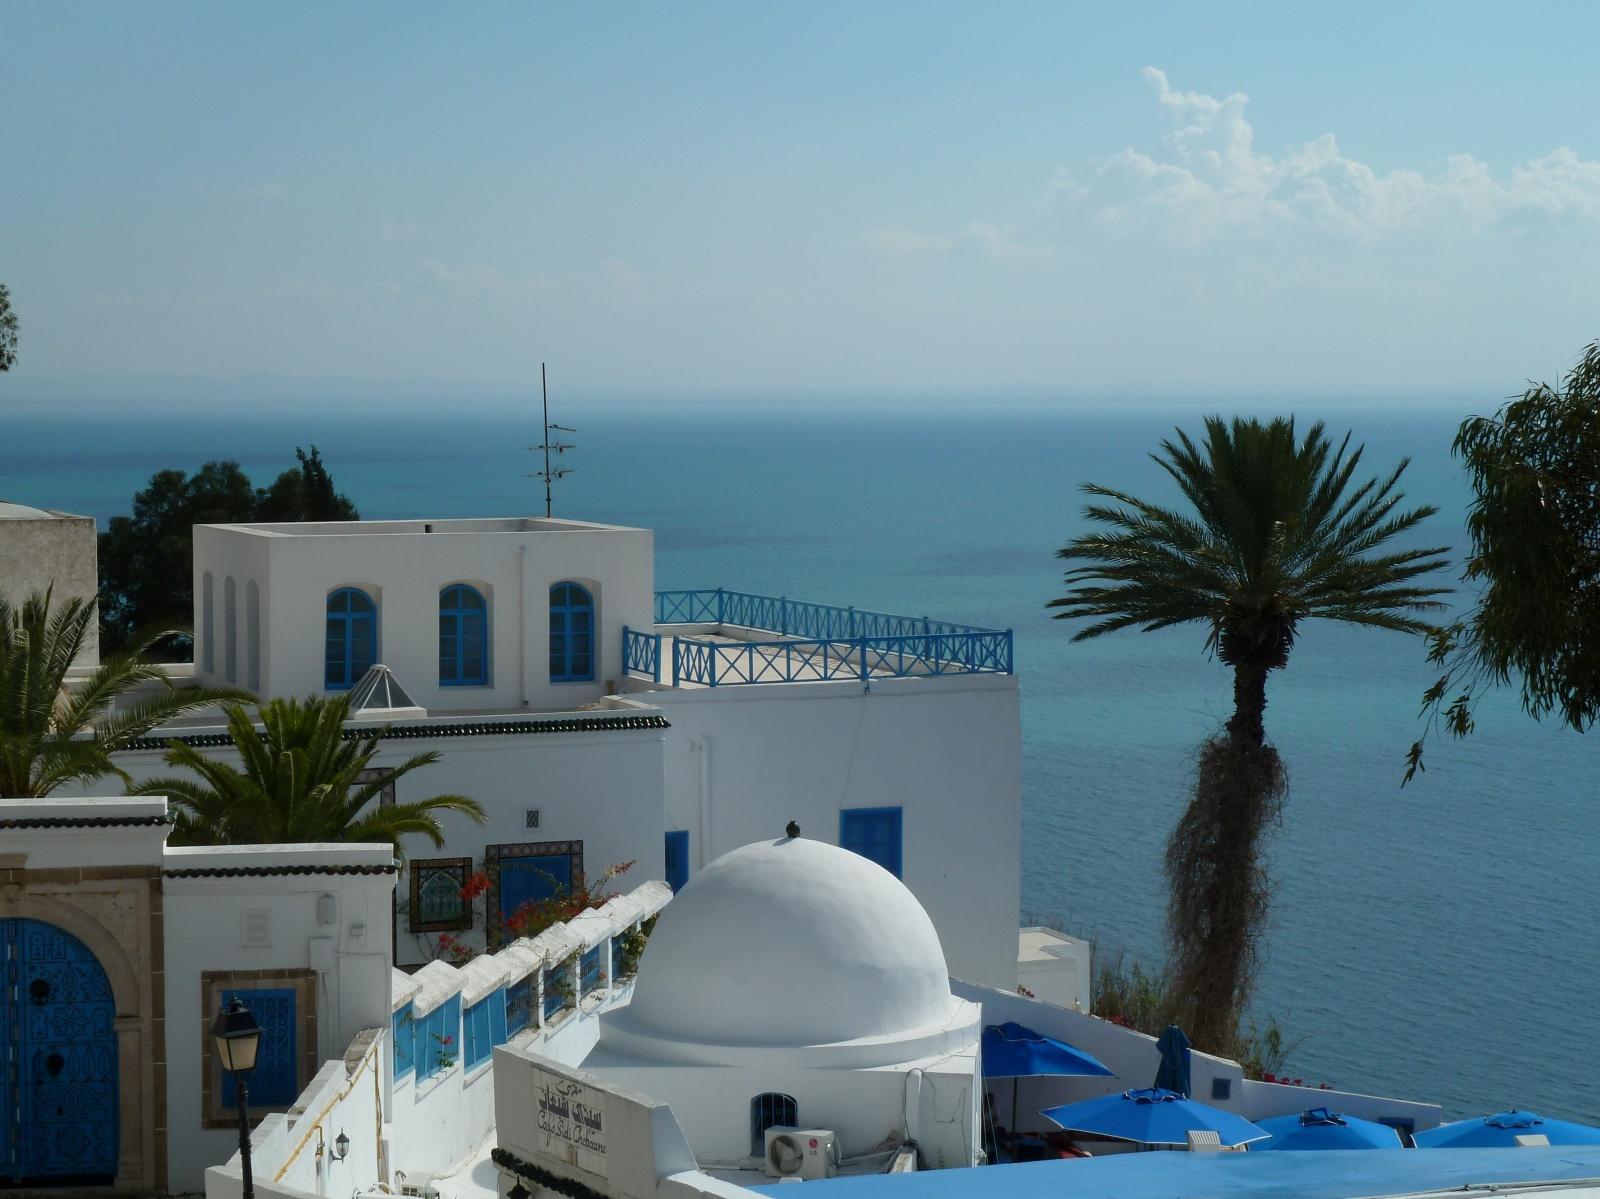 посмотреть город тунис фото рекомендуют пуховик